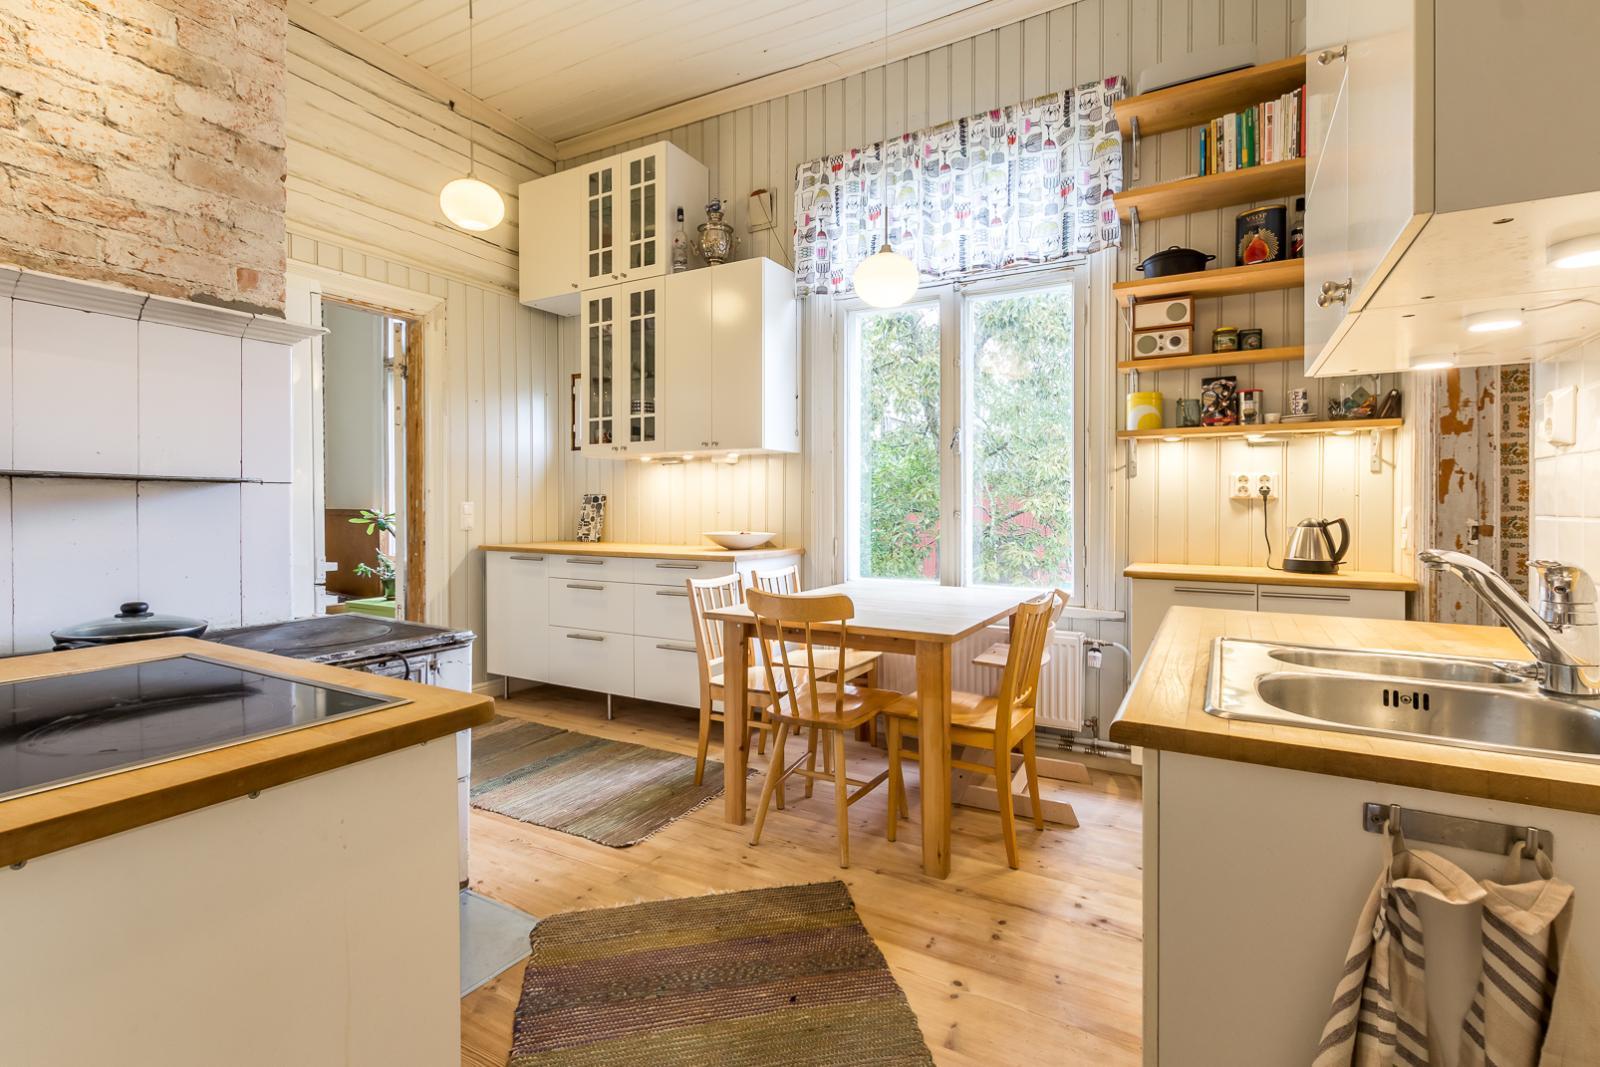 Puutalon kodikas keittiö  Etuovi com Ideat & vinkit